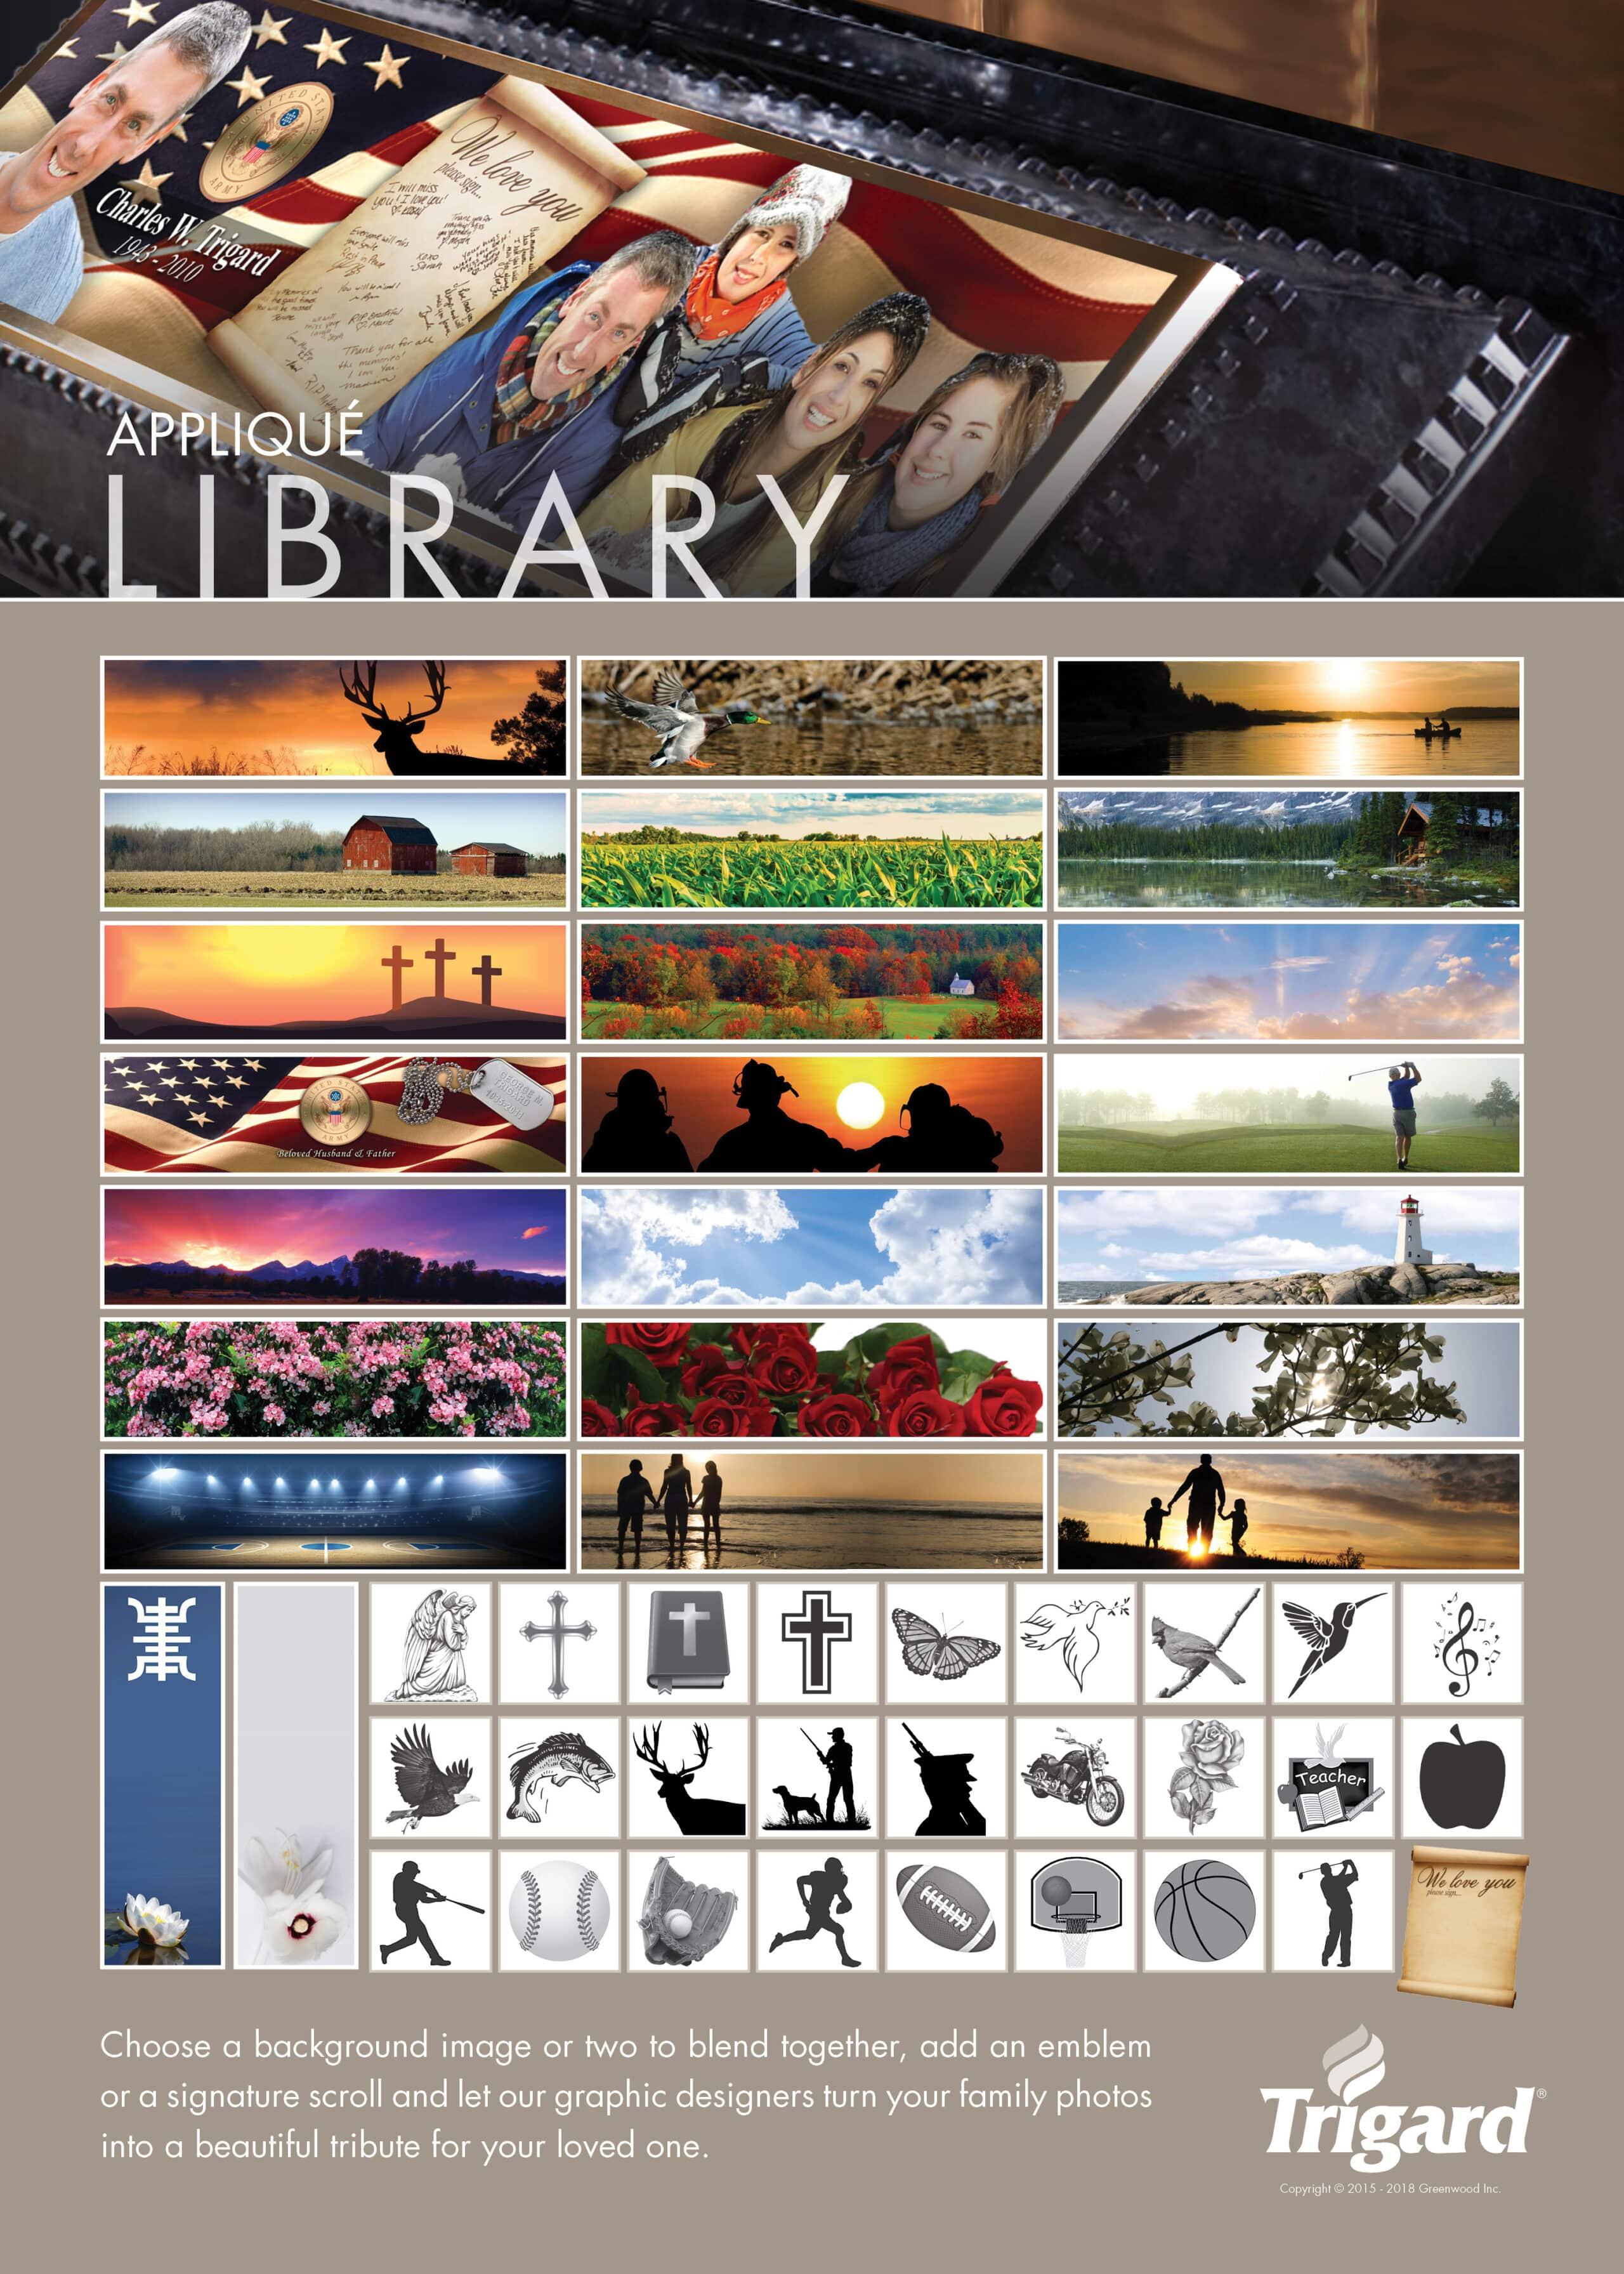 Applique Library 1